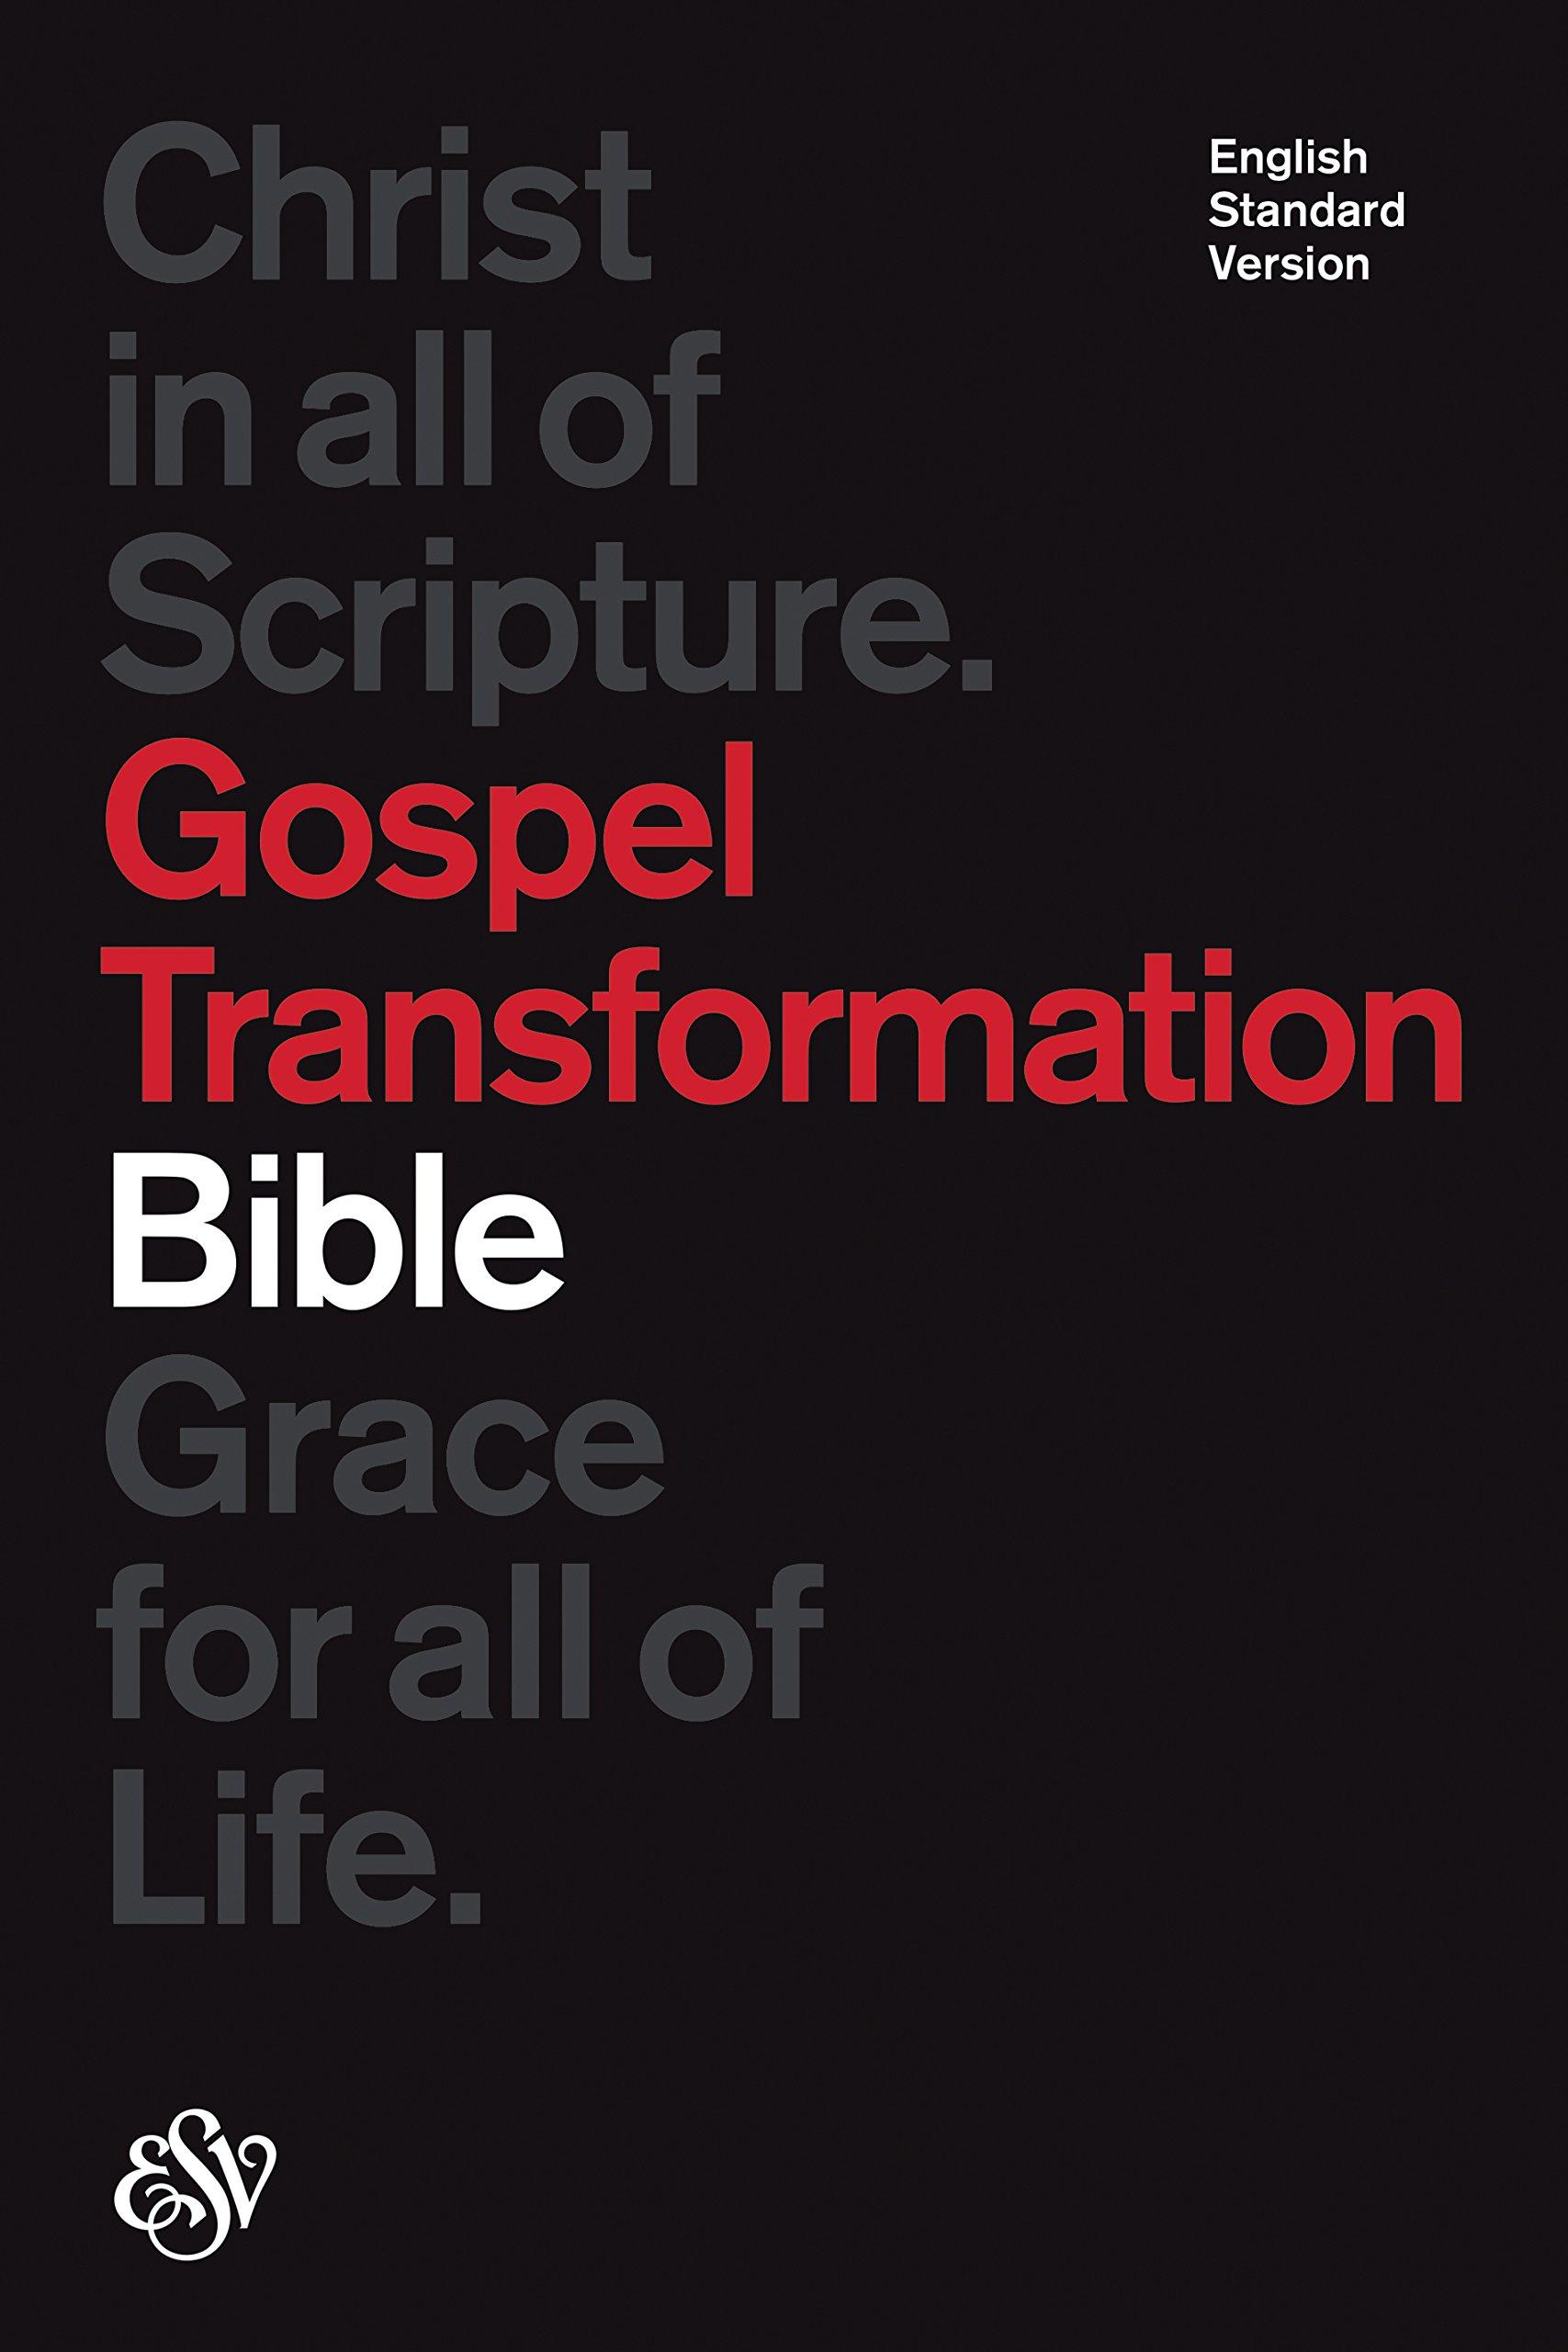 ESV Gospel Transformation Bible (Black): ESV Bibles by Crossway:  9781433538674: Amazon.com: Books